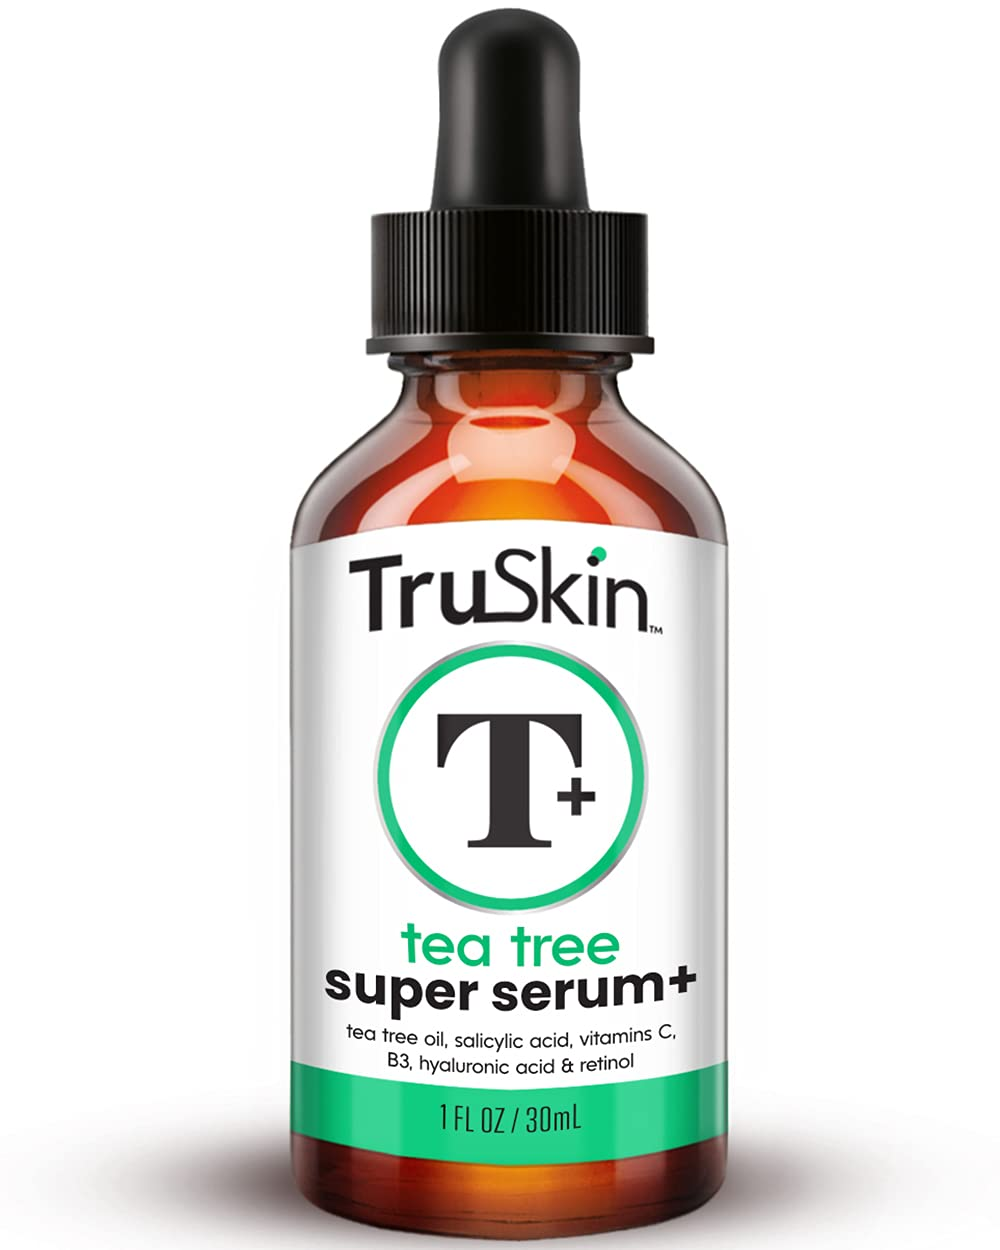 TruSkin Tea Tree Clear Skin Super Serum, Formulated for Acne Treatment with Tea Tree Oil, Vitamin C, Salicylic Acid & Retinol